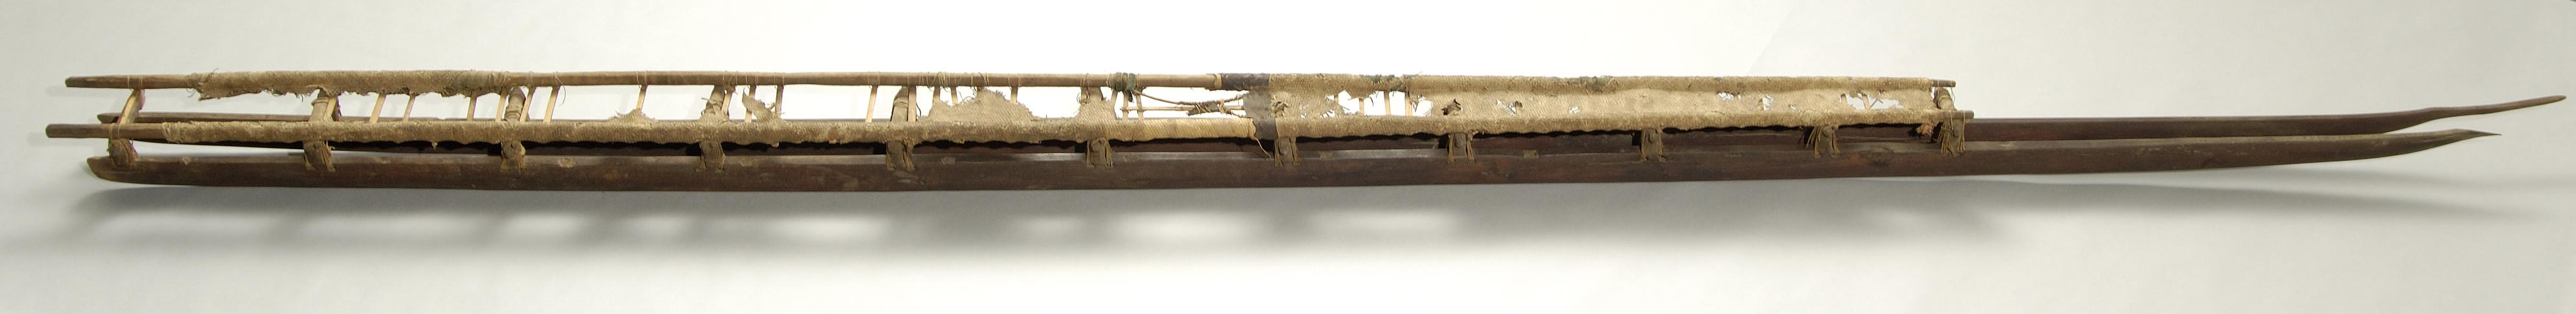 [Papa hōlua] Made primarily of kauila and makaloa. It is said to have belonged to Lonoikamakahiki. Photo by David Franzen.